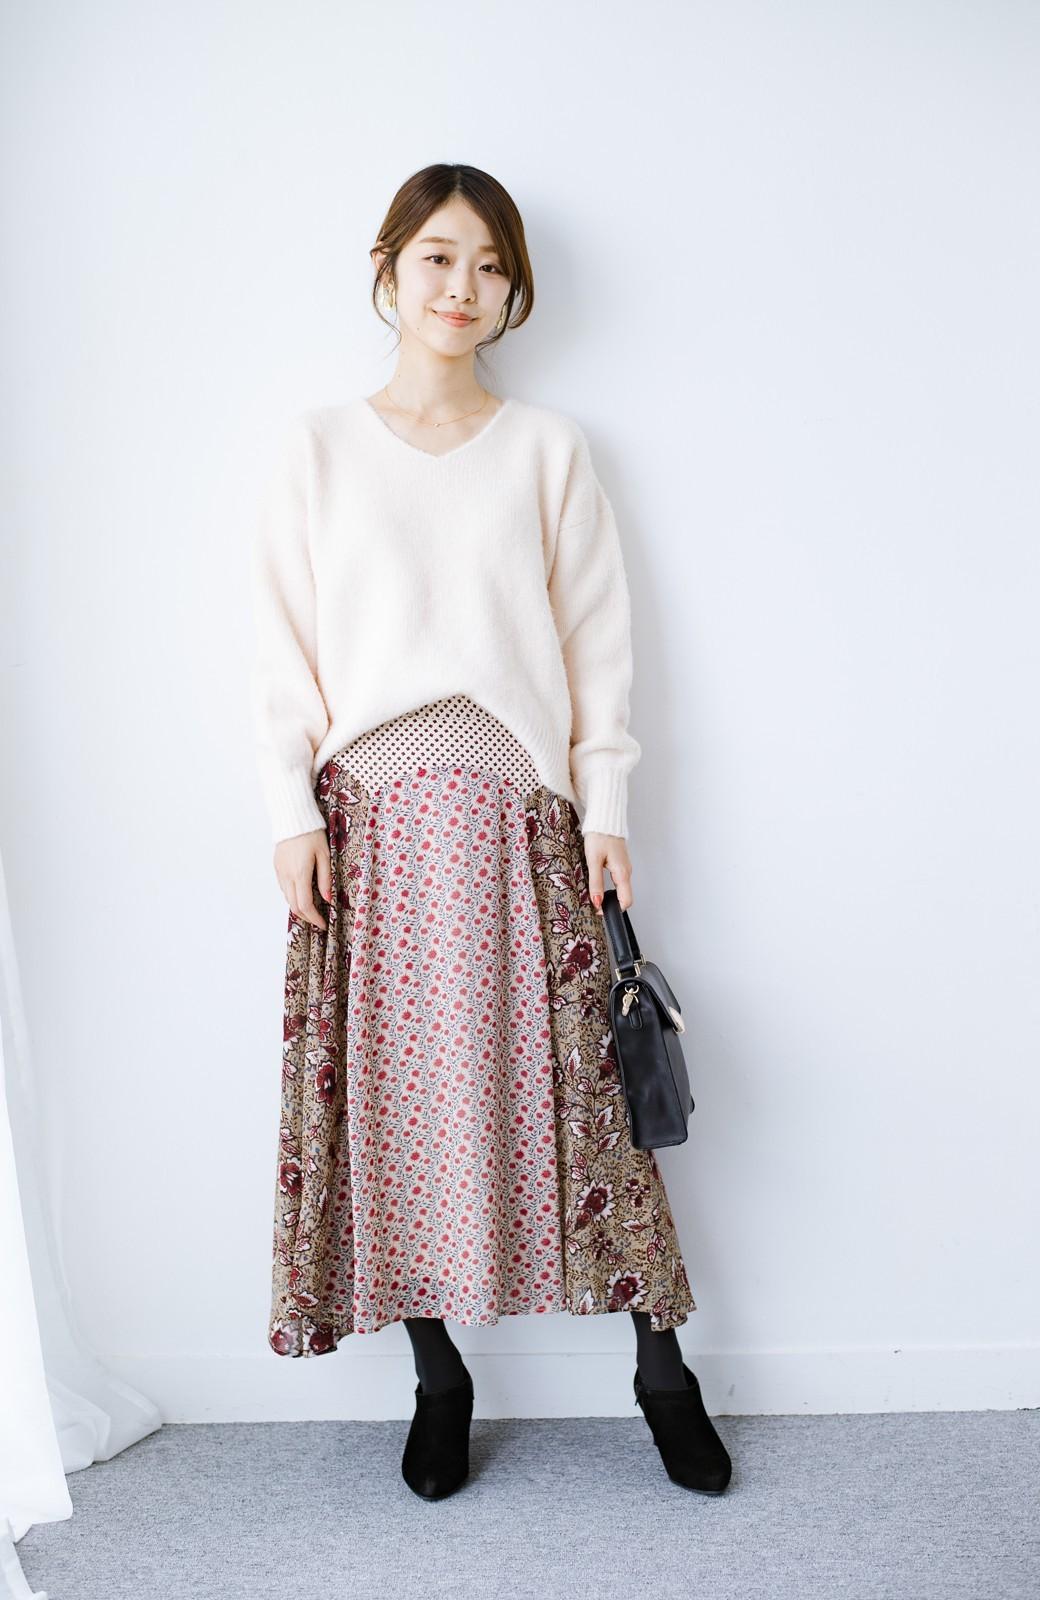 haco! 【洗濯機洗いOK】シンプルなトップスに合わせるだけでかわいくなれる MIX柄スカート <ベージュ系その他>の商品写真17